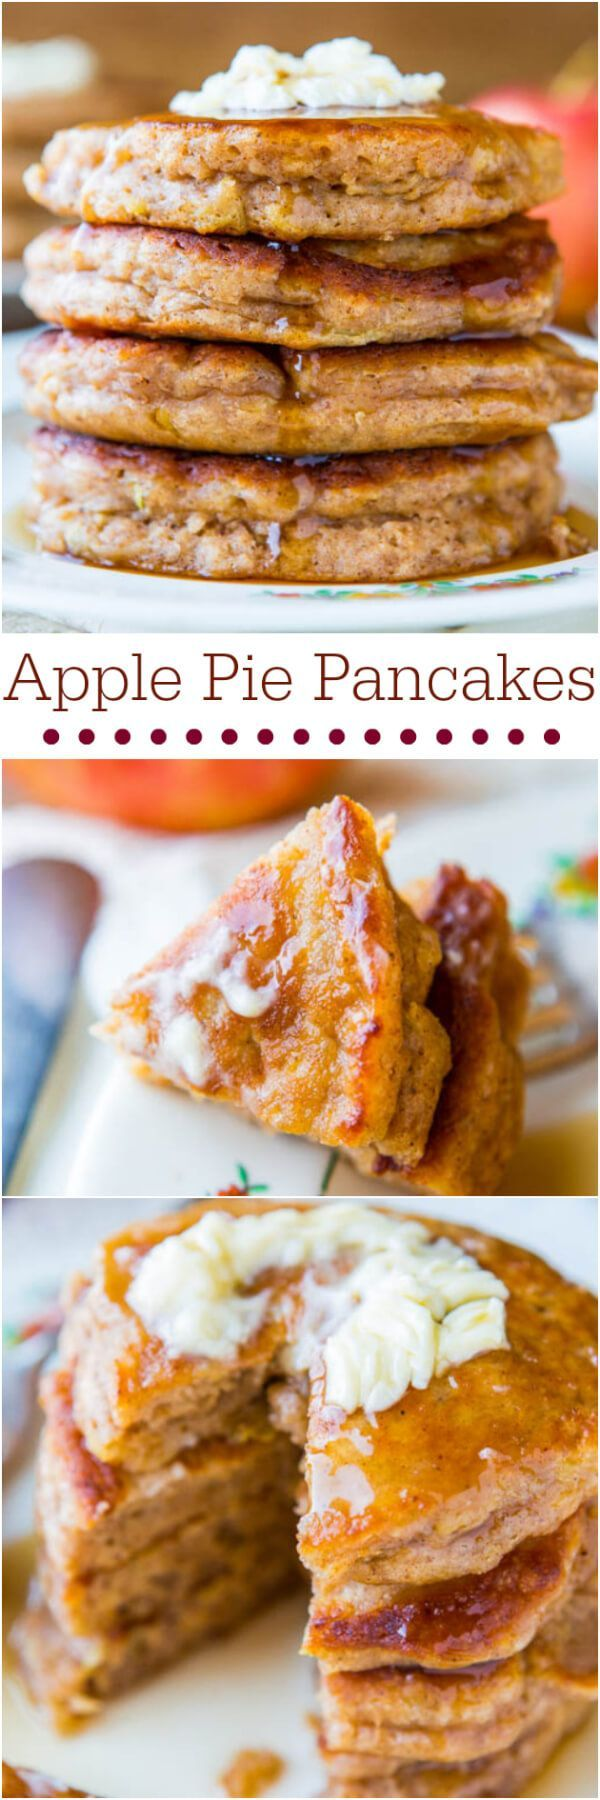 Apple Pie Pancakes with Vanilla Maple Syrup Recipe